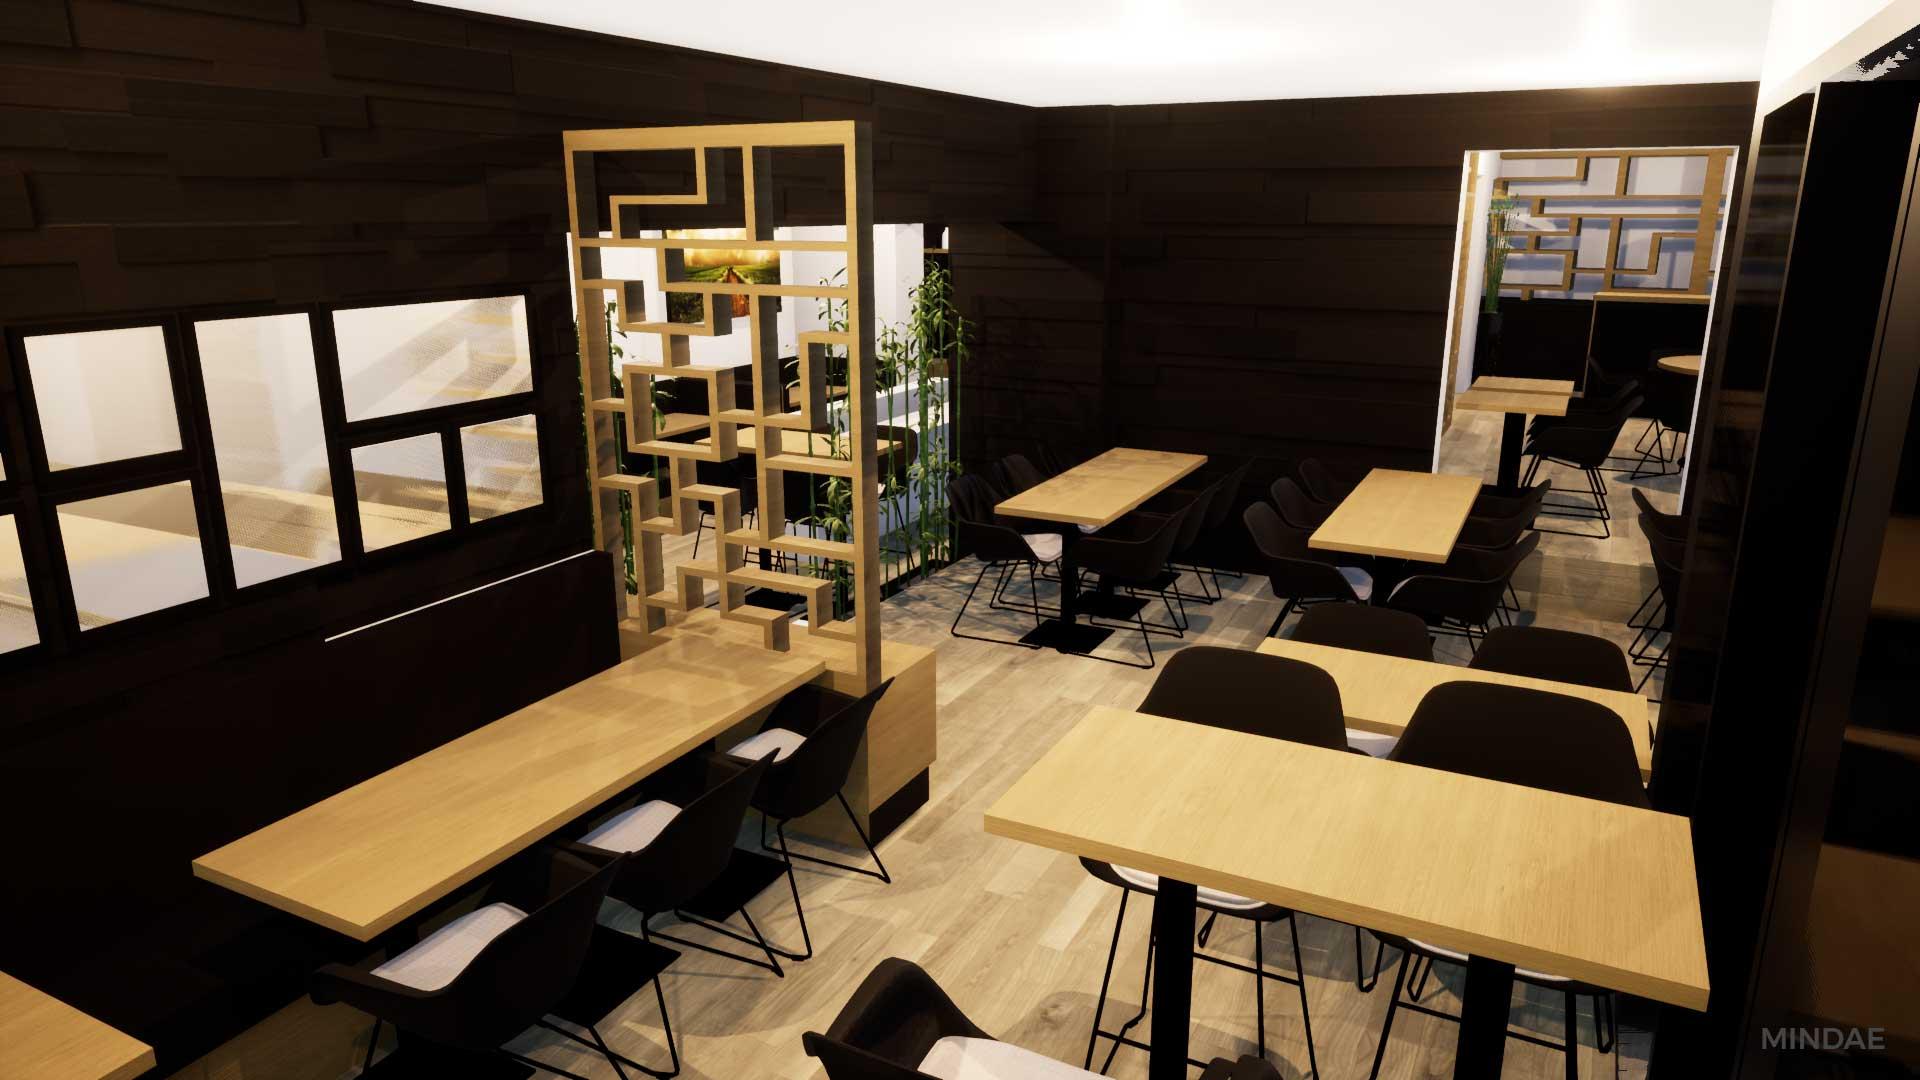 Mindae_3D_restaurant_caen_republique_agencement_bois_terrasse_comptoir-(7)